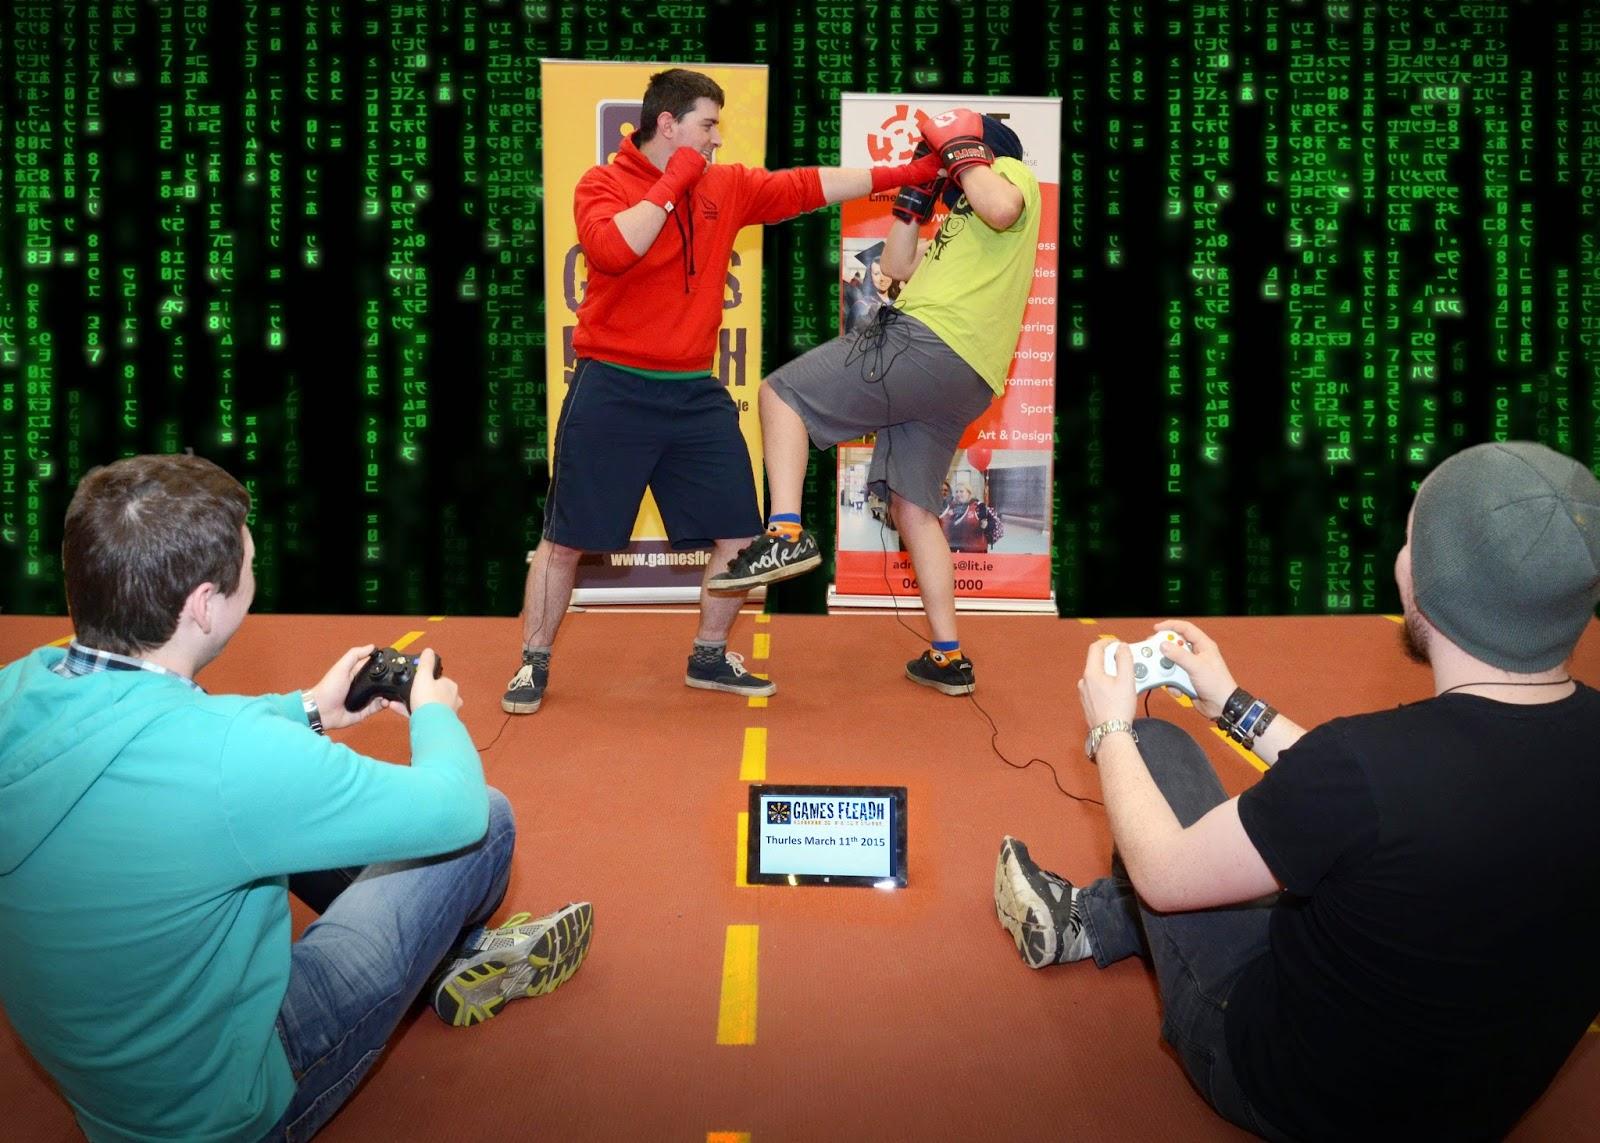 Games Fleadh showcases Irish gaming industry